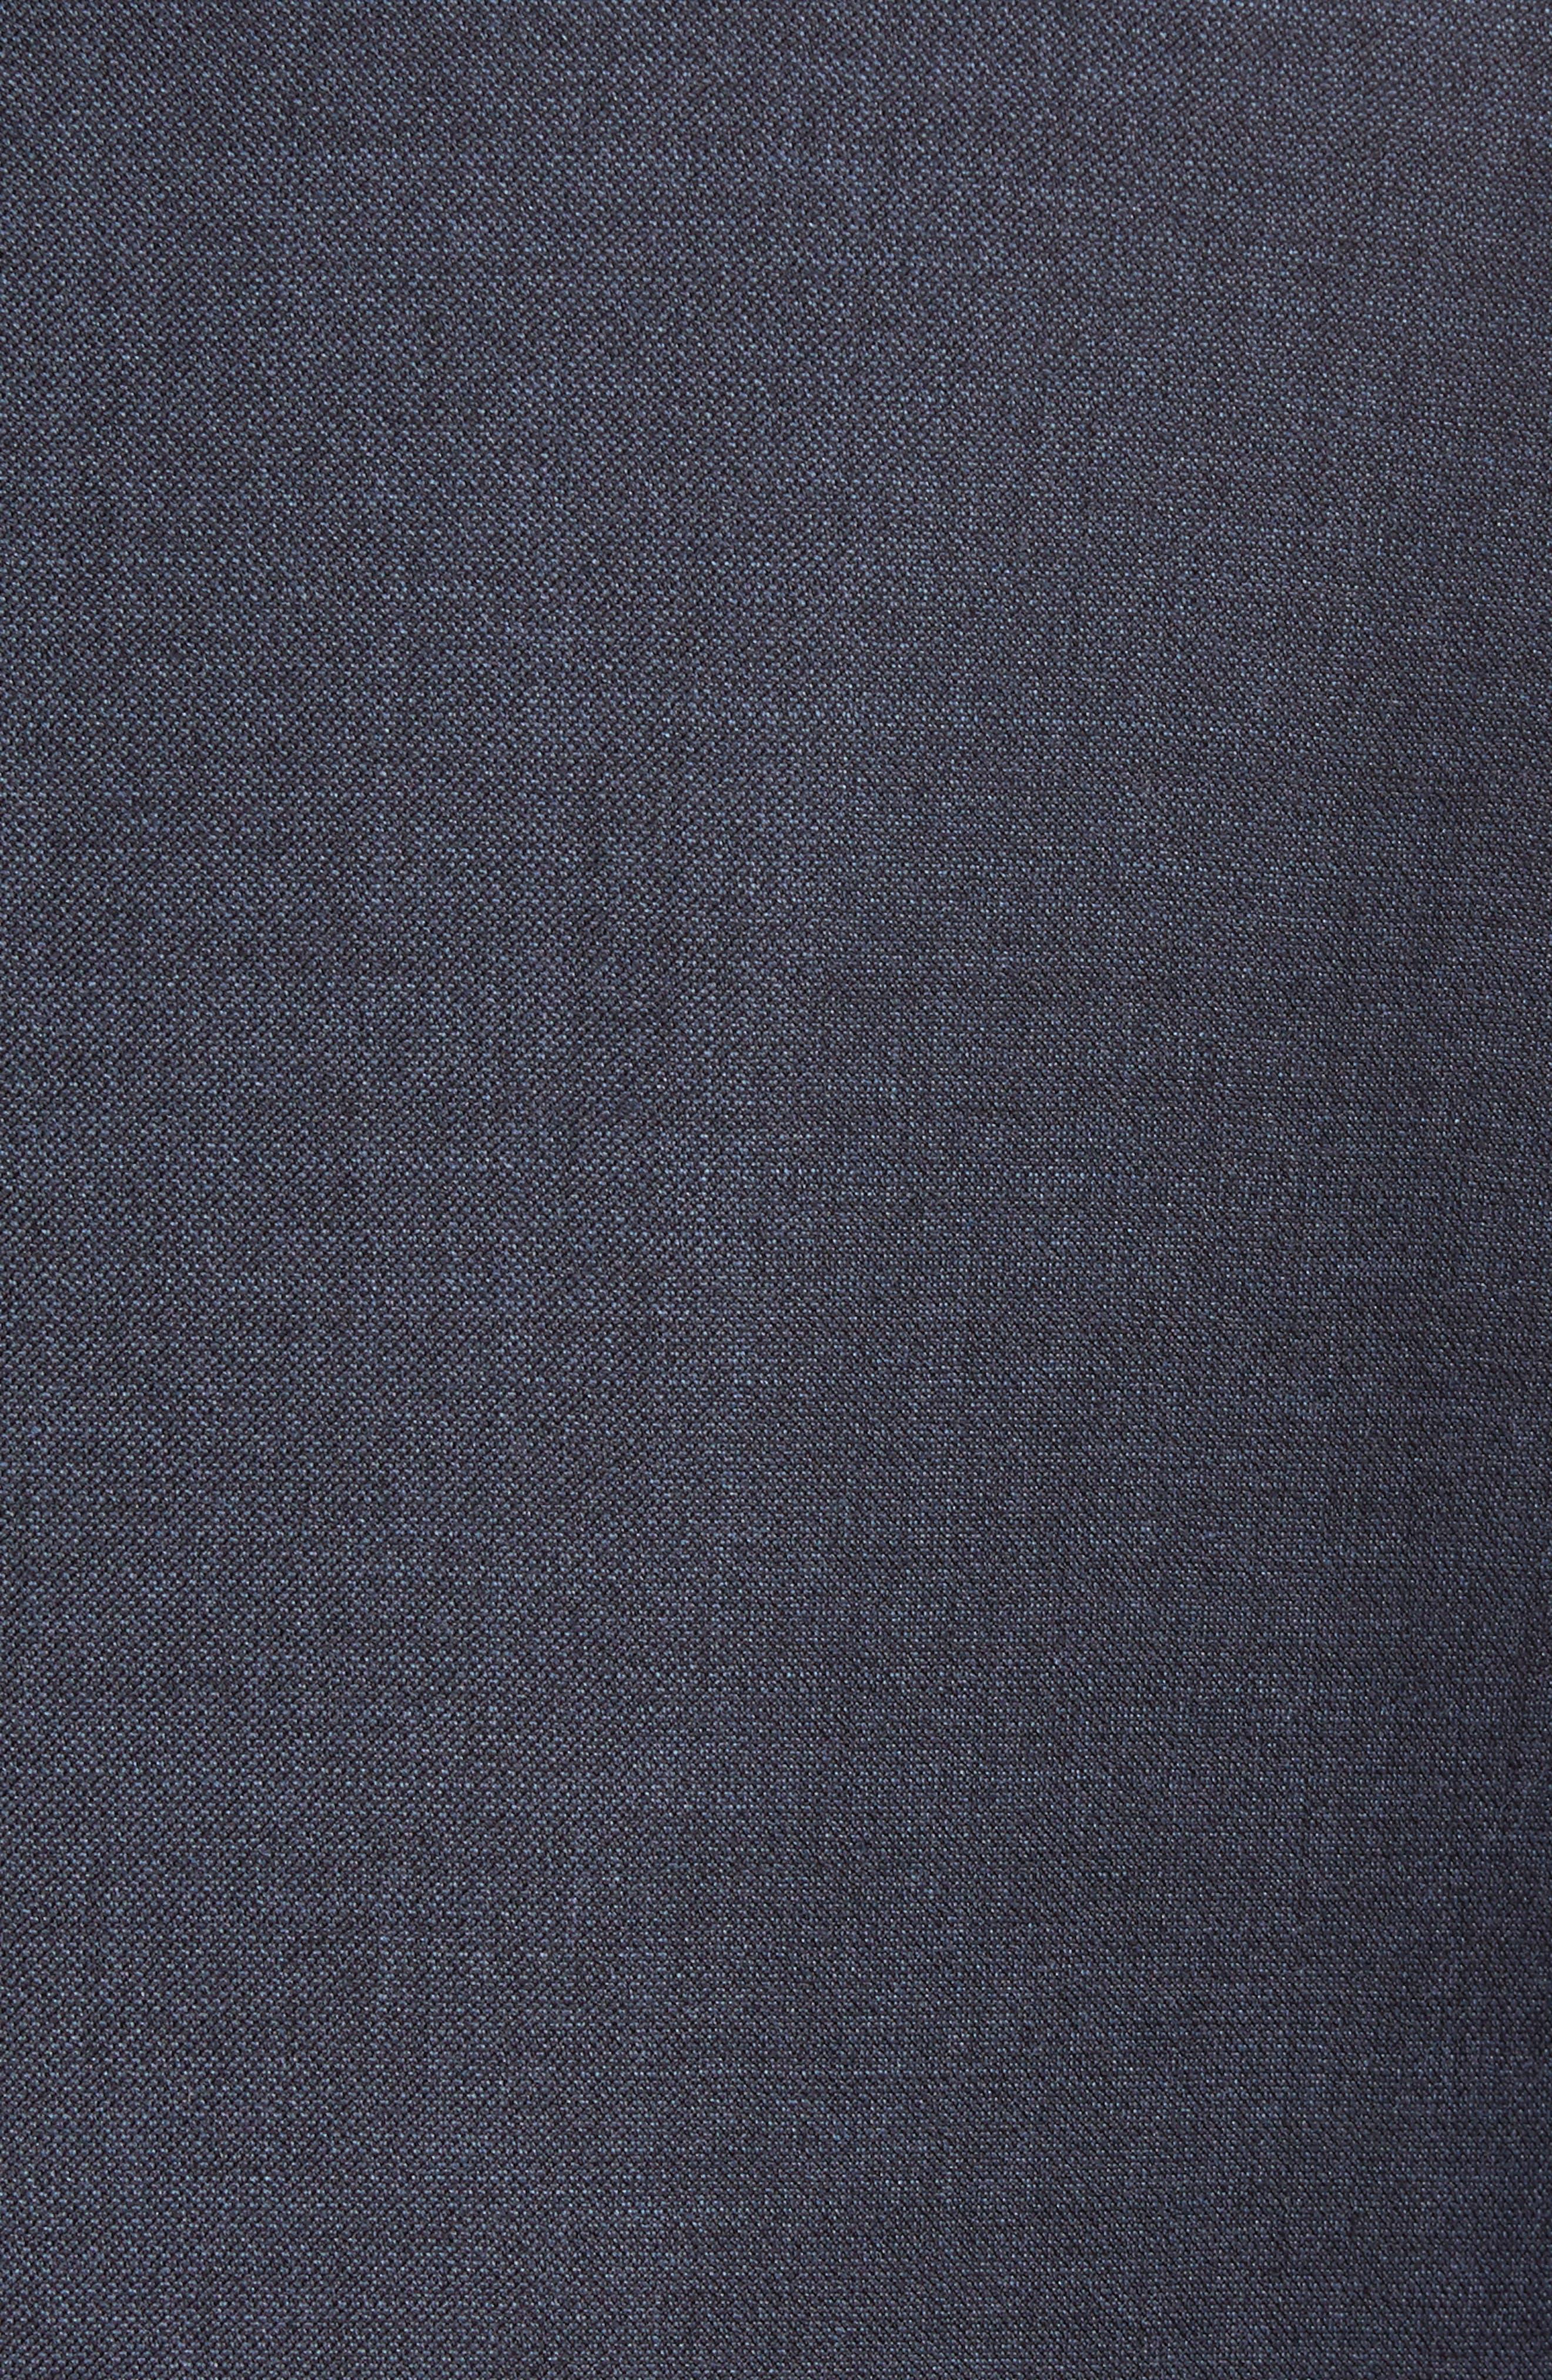 Alternate Image 4  - J.Crew Ludlow Trim Fit Solid Wool Sport Coat